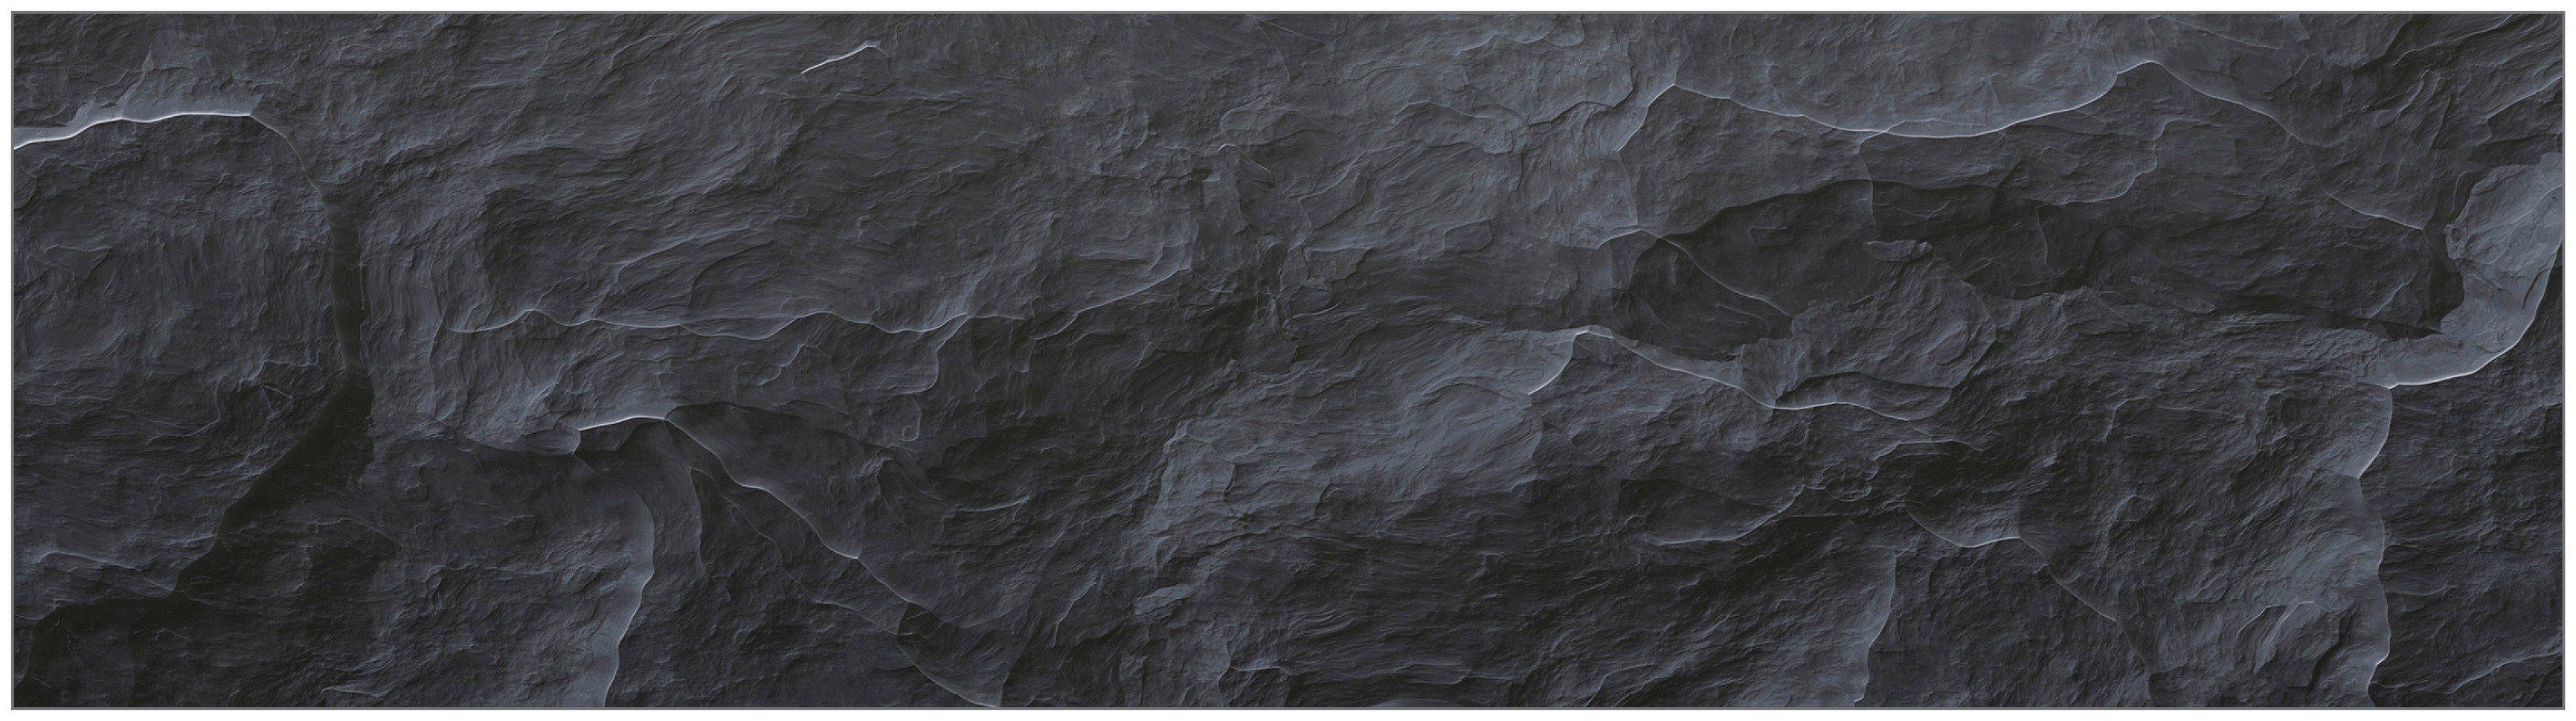 Küchenrückwand - Spritzschutz »profix«, Schiefer, 220x60 cm